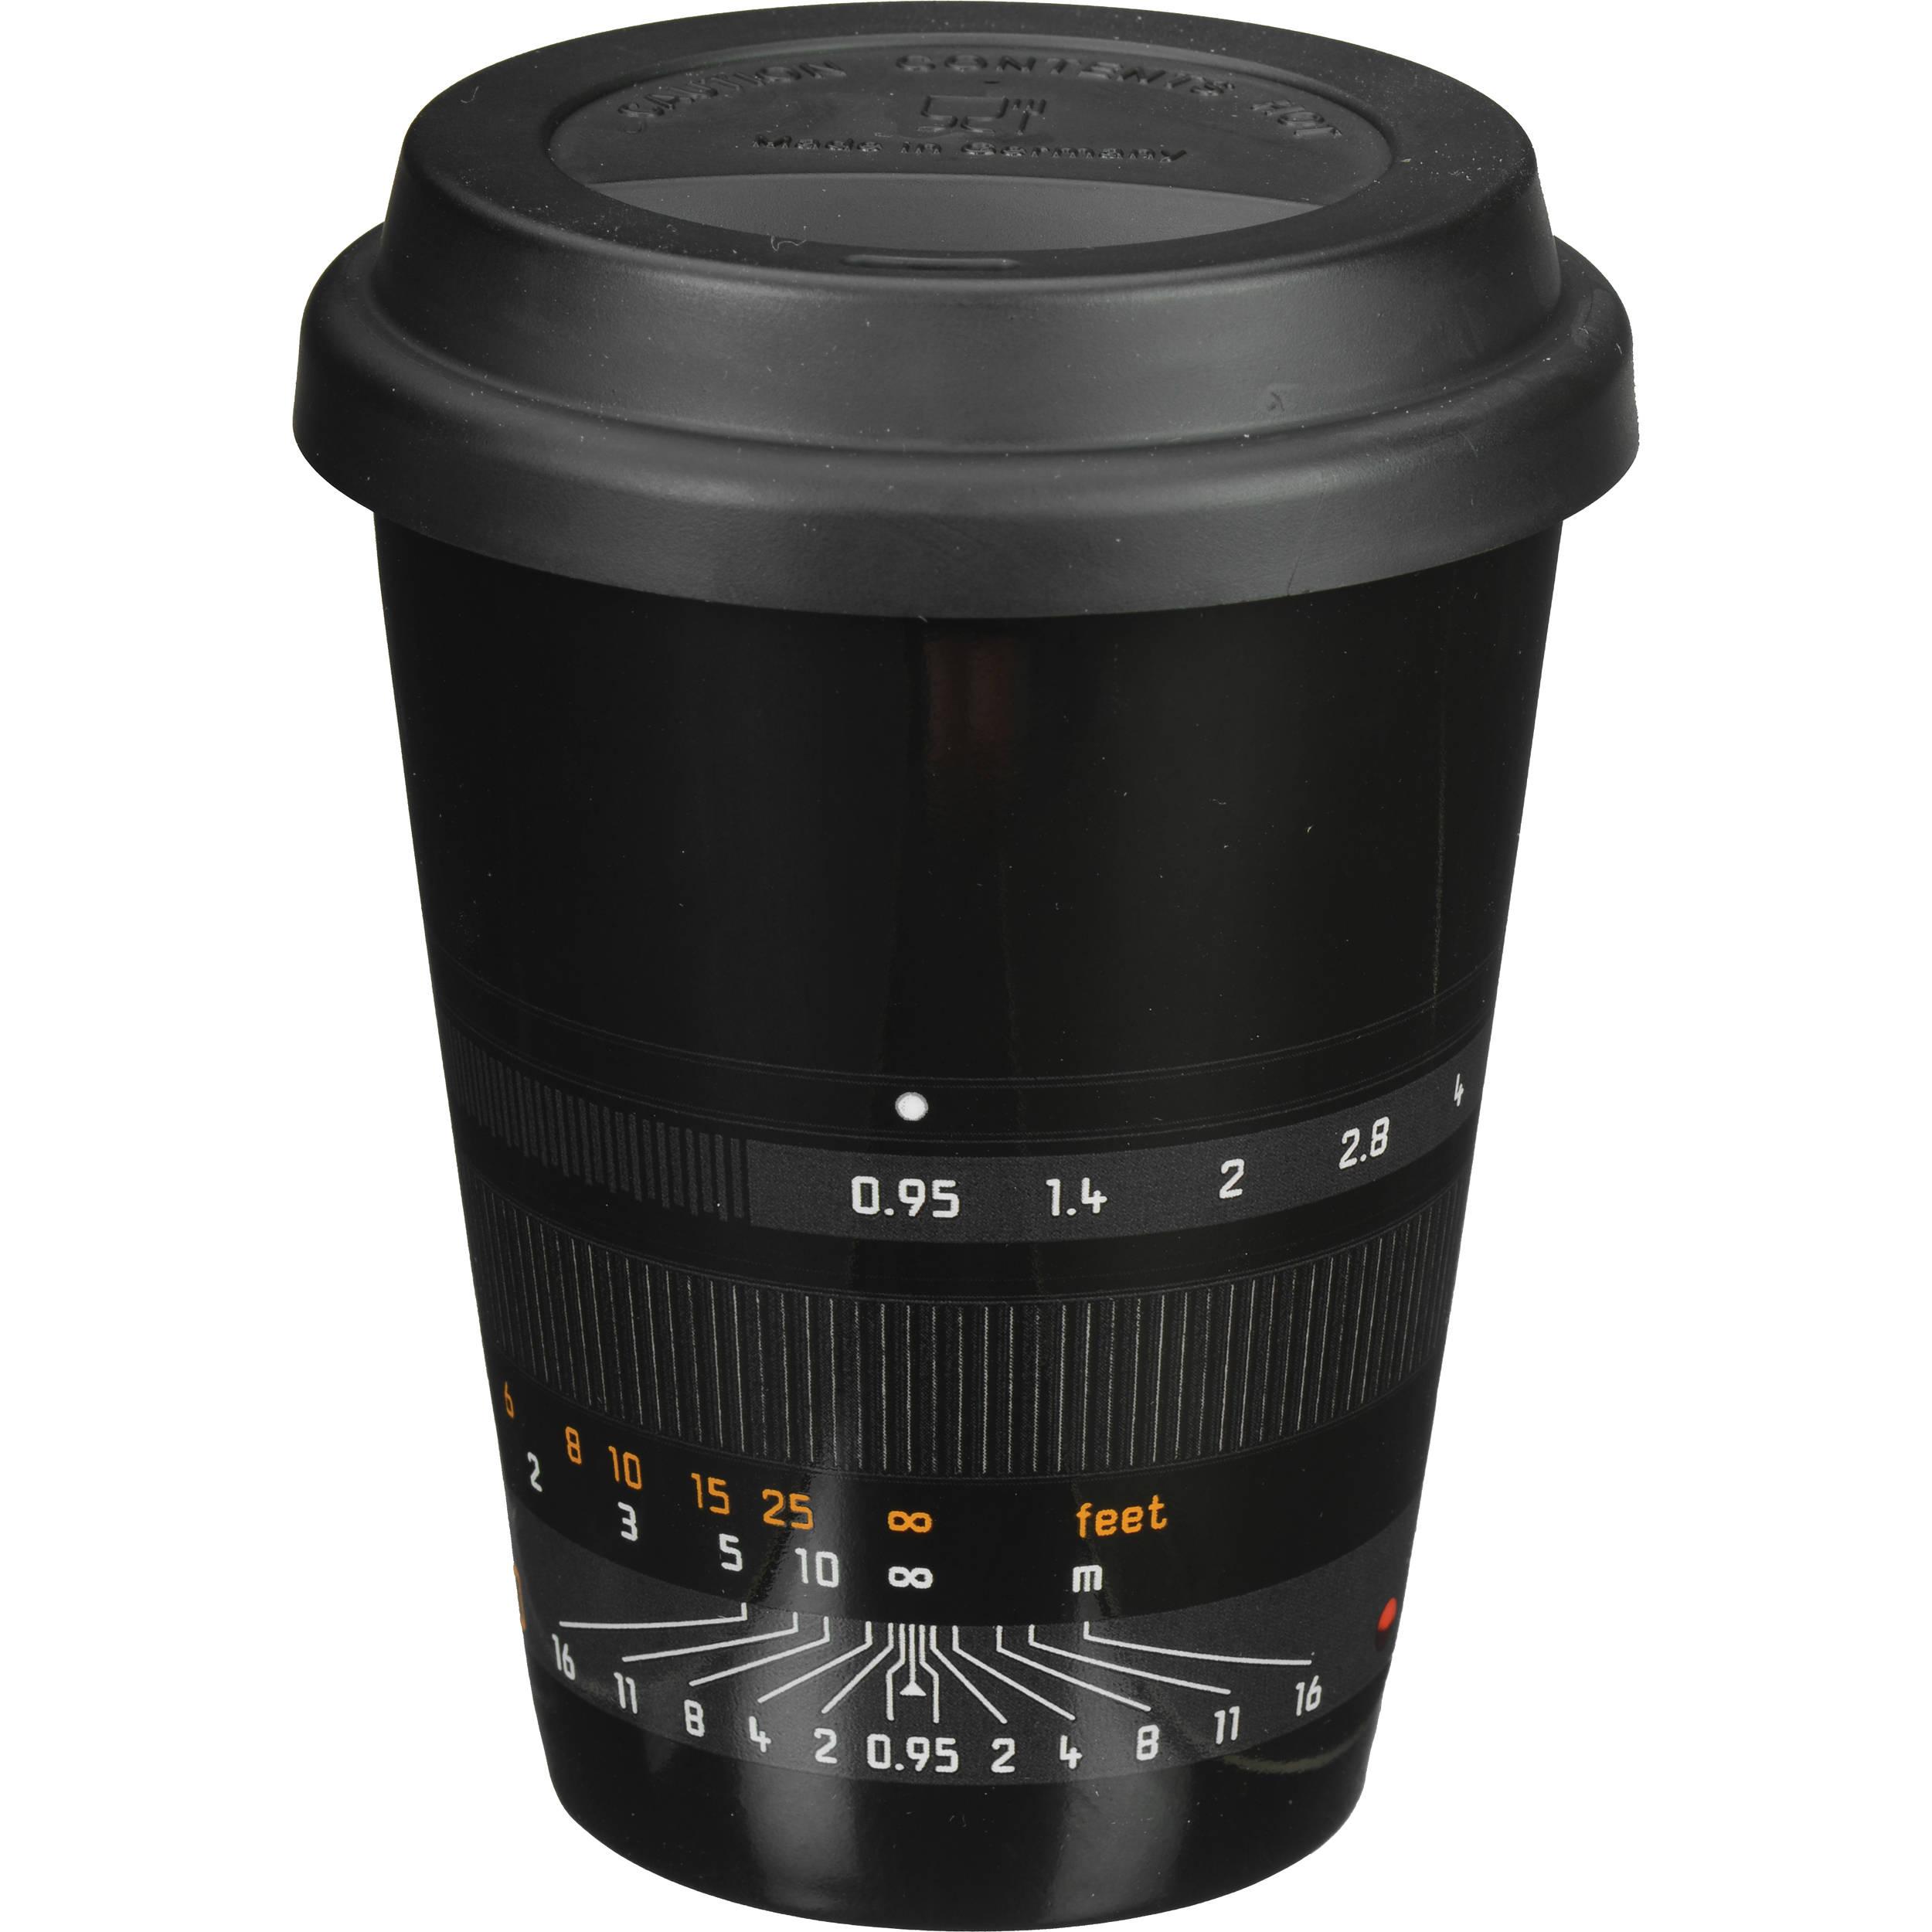 Considerable Leica Ceramic Coffee Mug Leica Ceramic Coffee Mug Photo Coffee Mug Images Free Coffee Mug Images furniture Coffee Mug Images